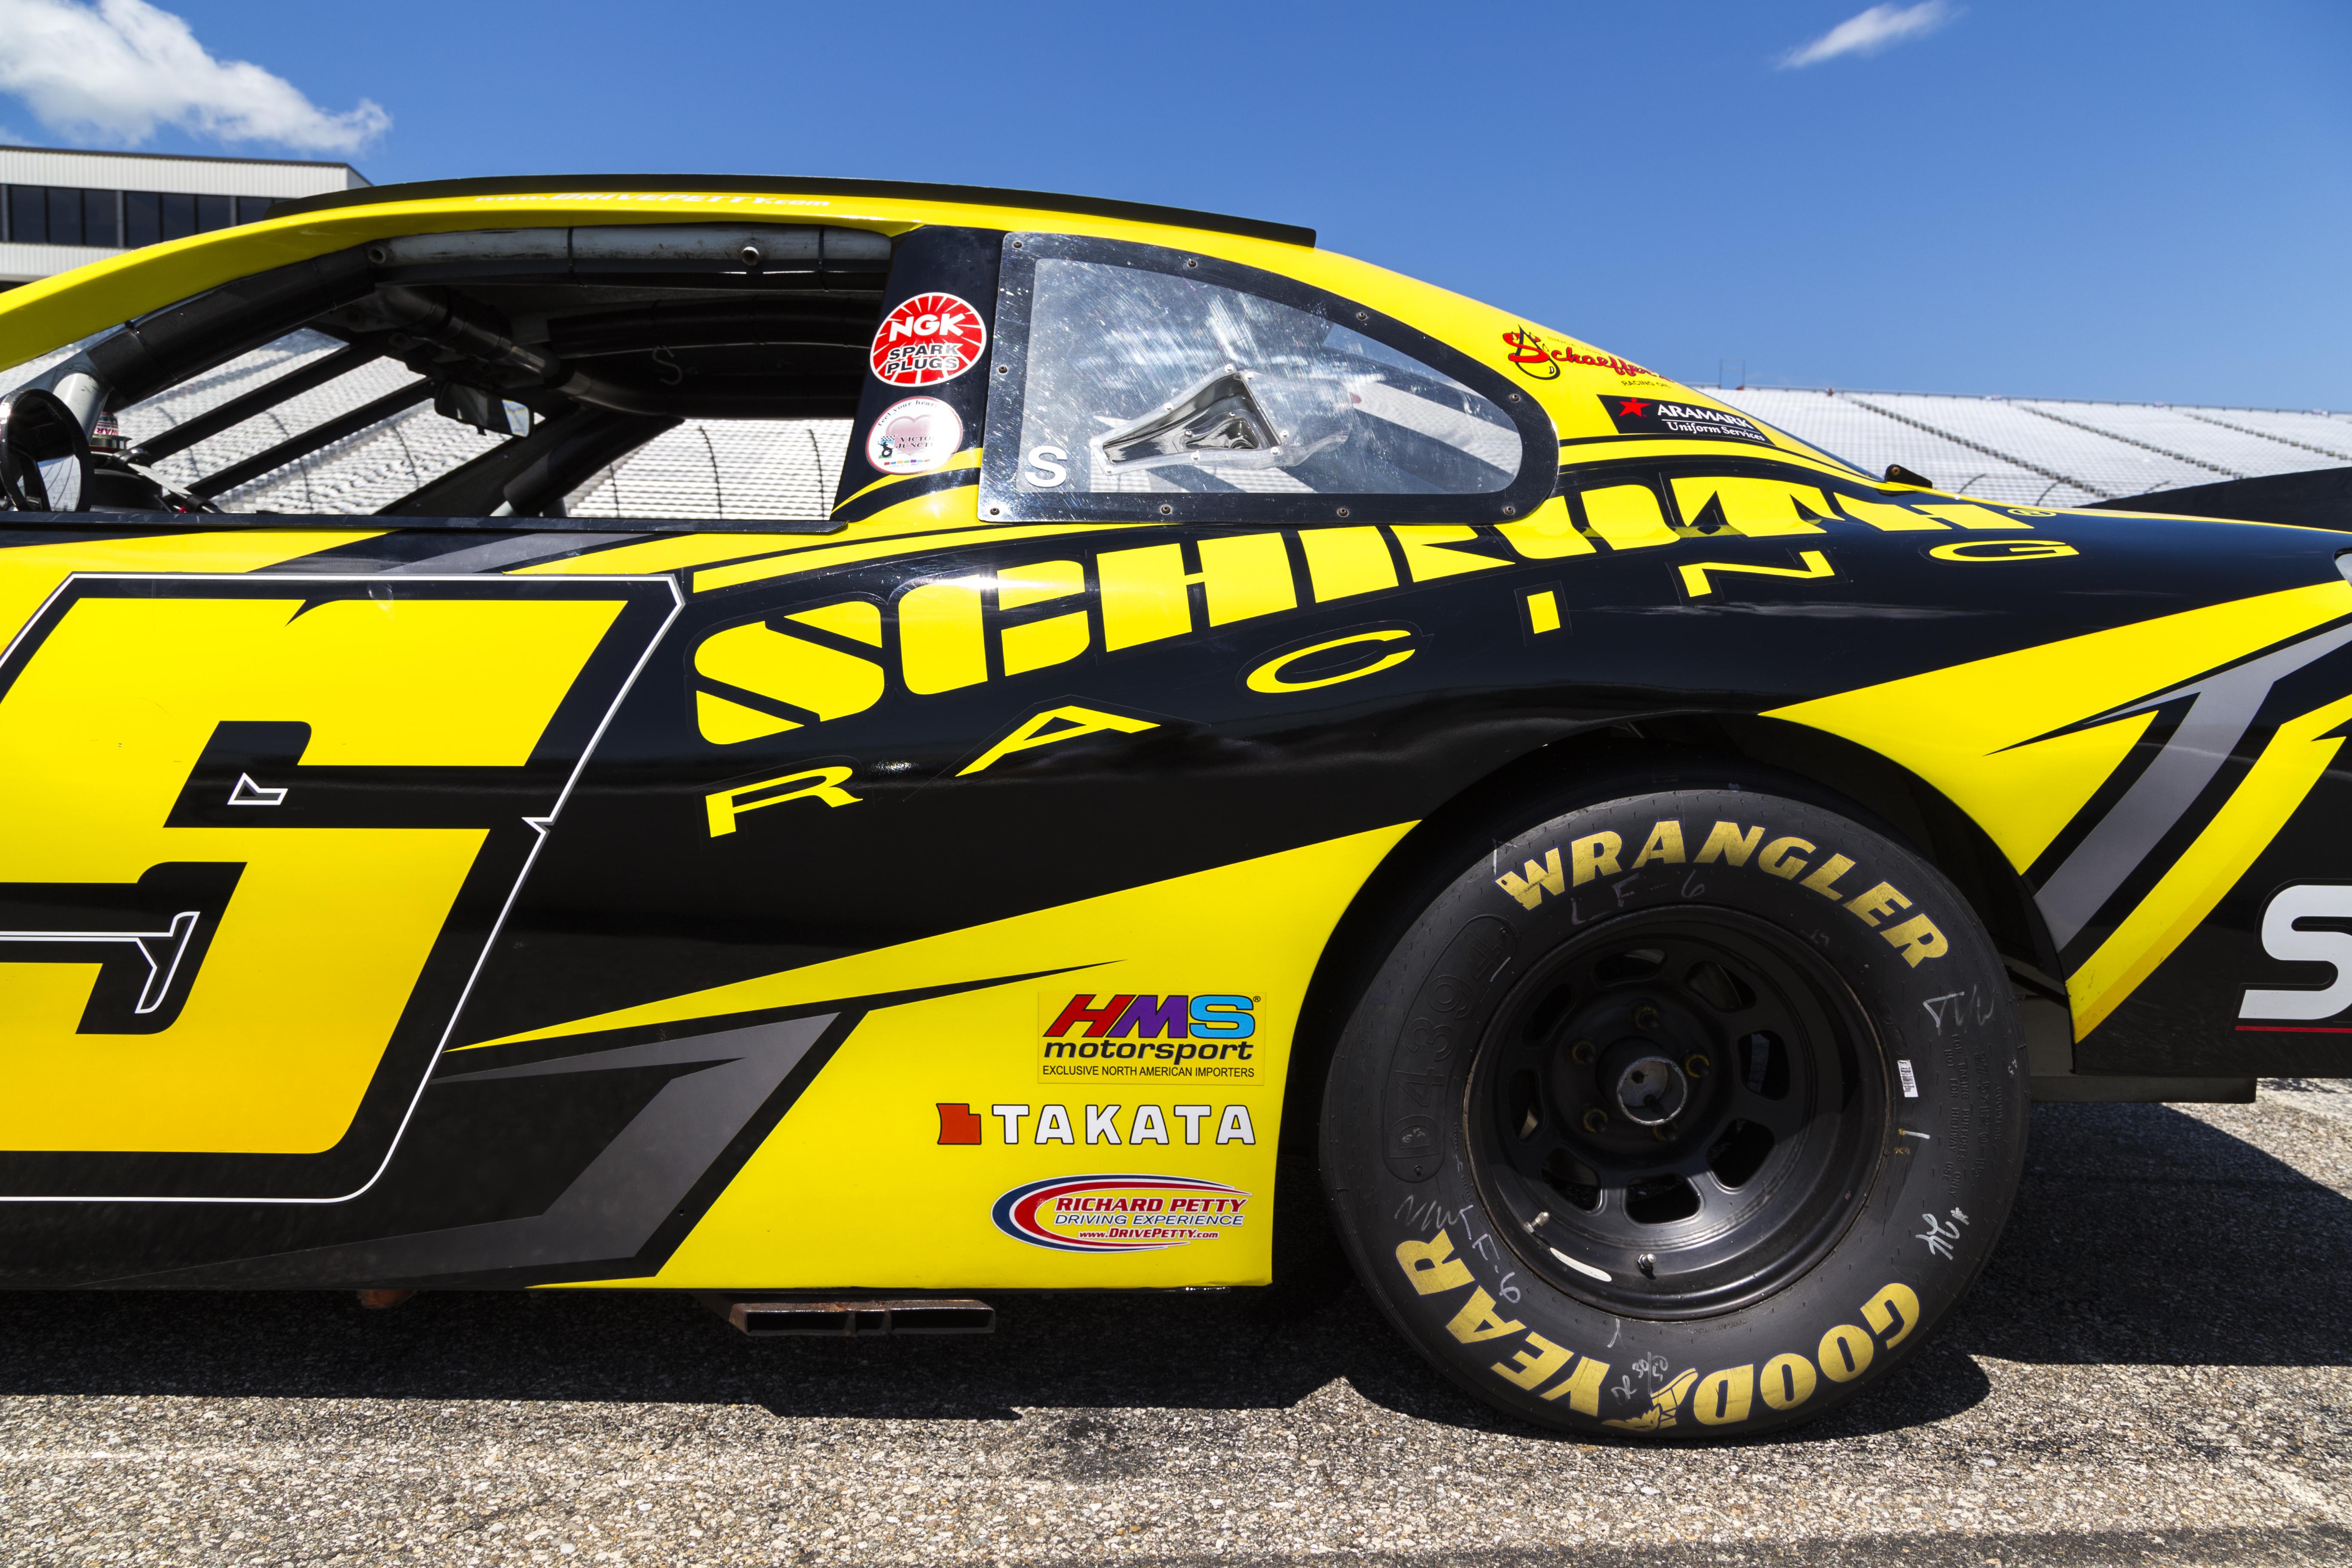 Schroth Racing Car - Nitro Designs